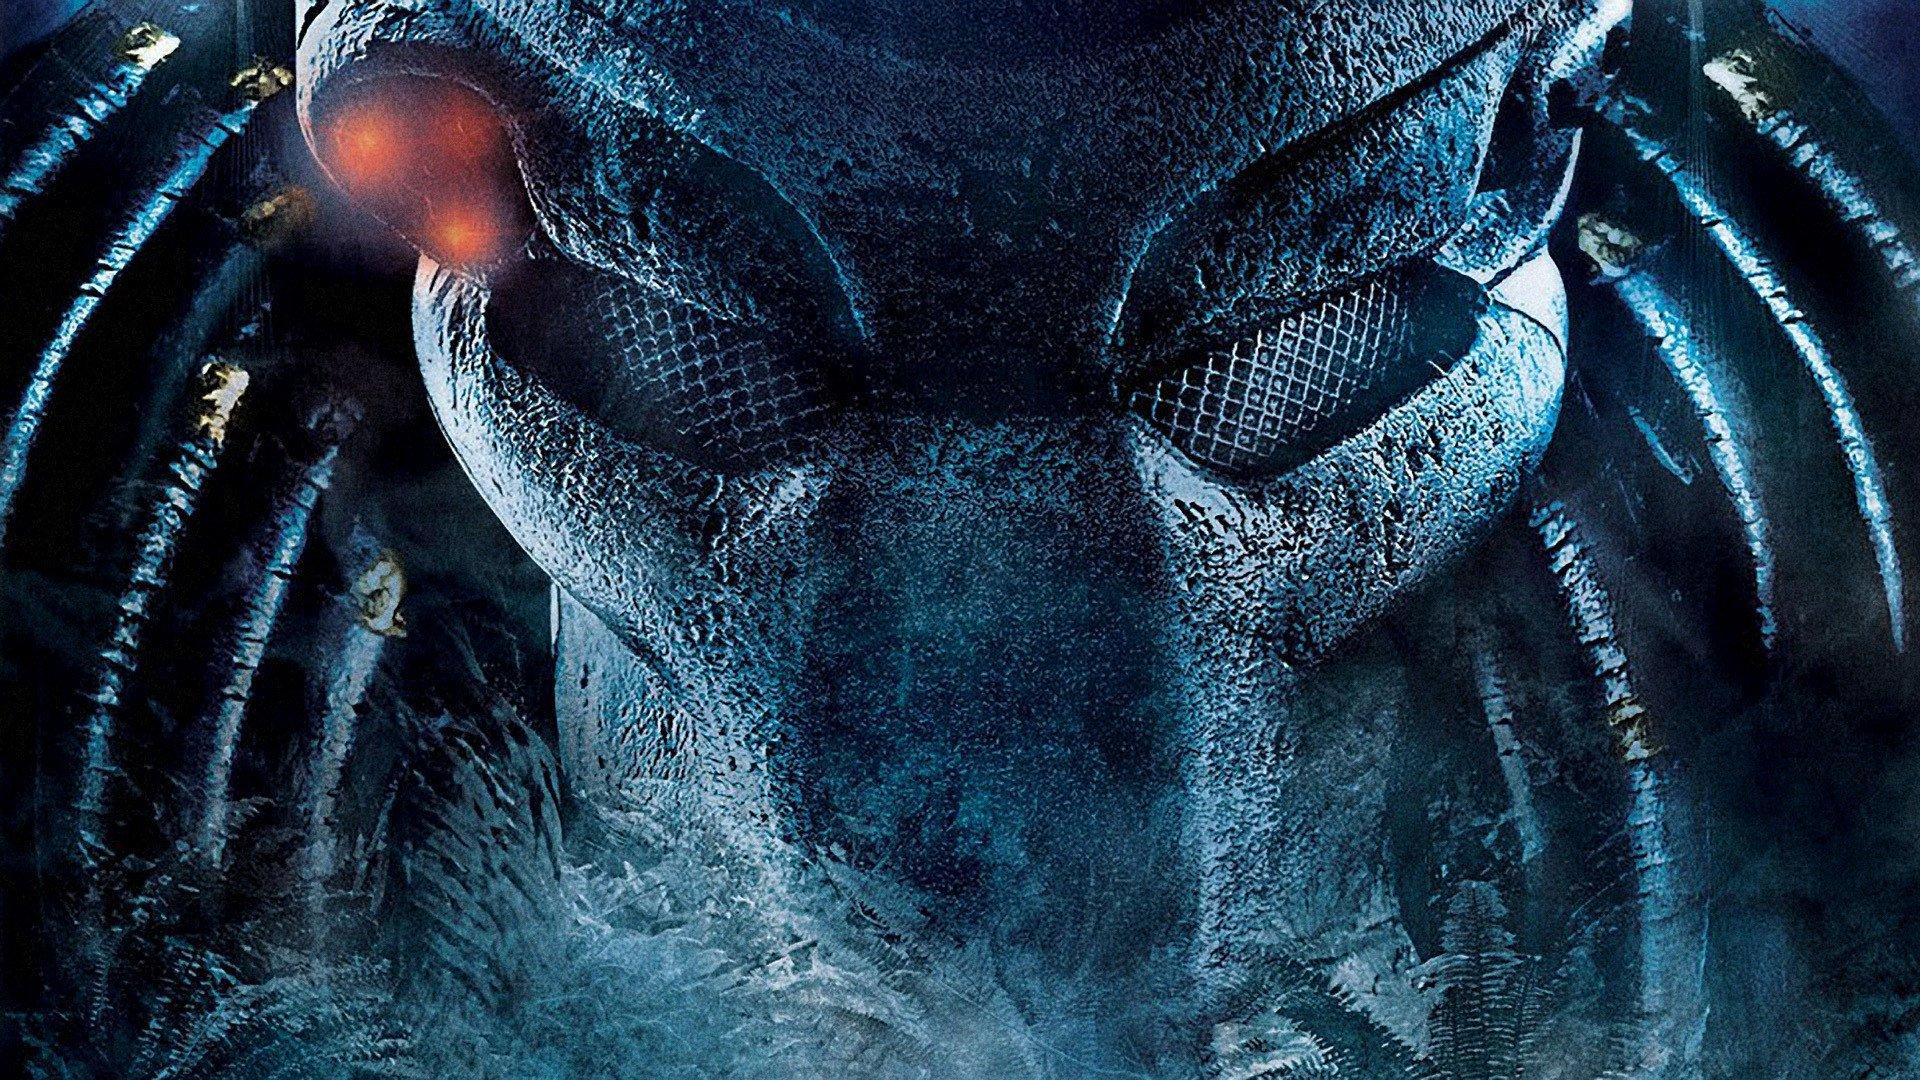 Хищник и Спаун метят в Mortal Kombat X